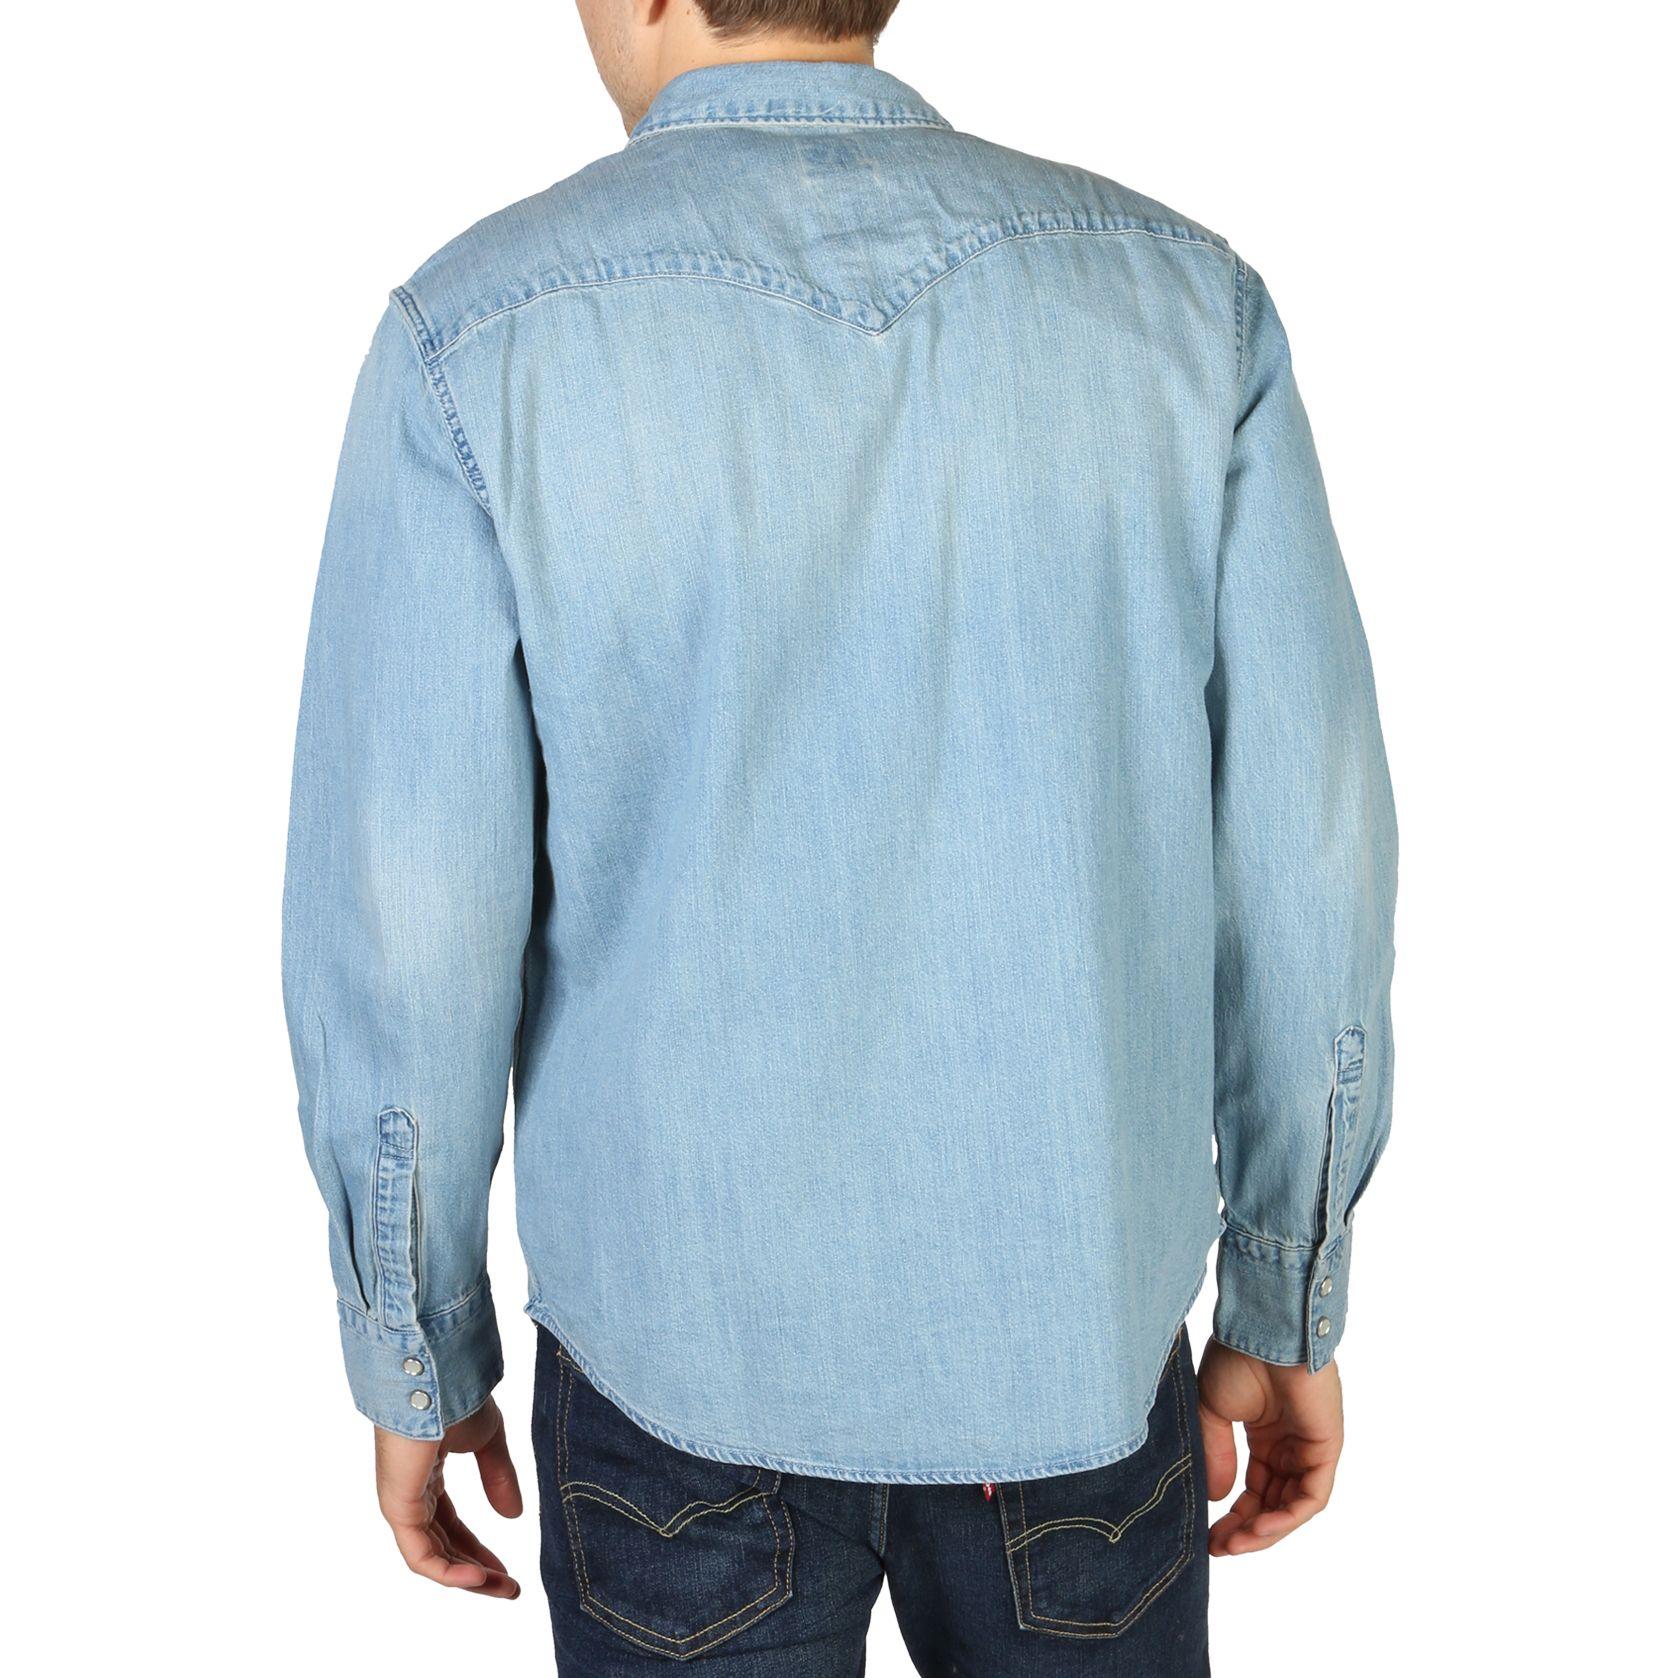 Levi's – 85744_BARSTOW-WESTERN – Azul